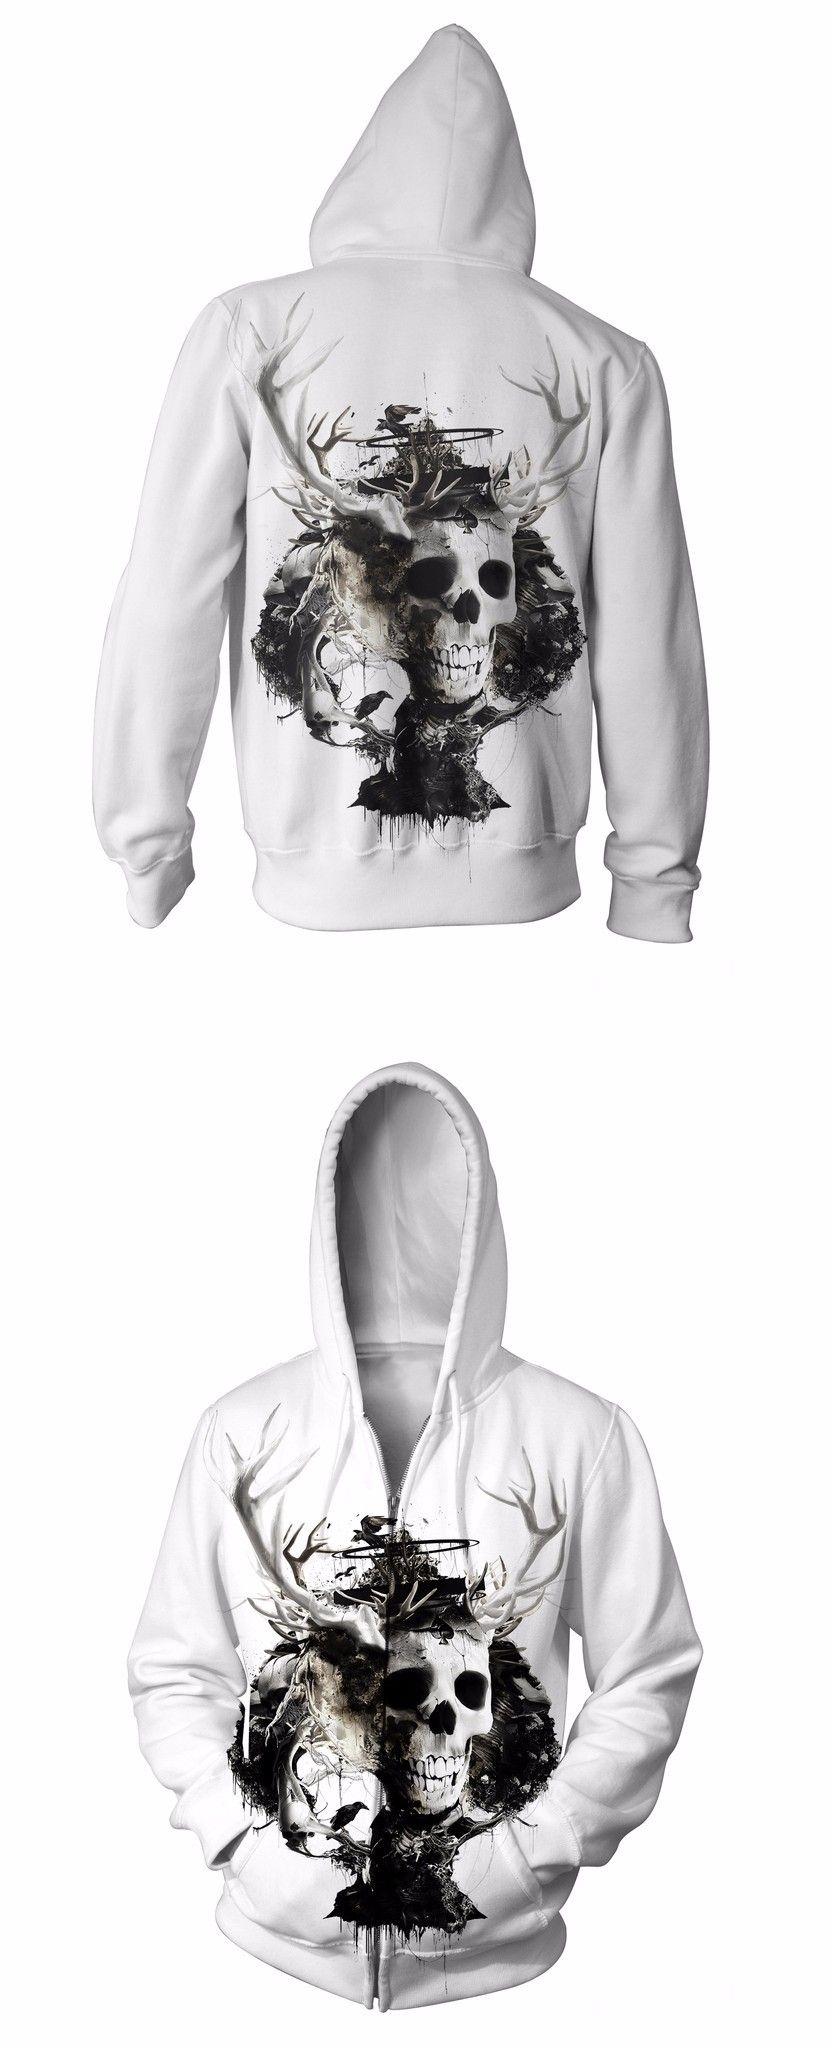 da7b248fabbc 2017 new fashion Cool sweatshirt Hoodies Men women print Skull elk hot  Style Streetwear Long sleeve clothes